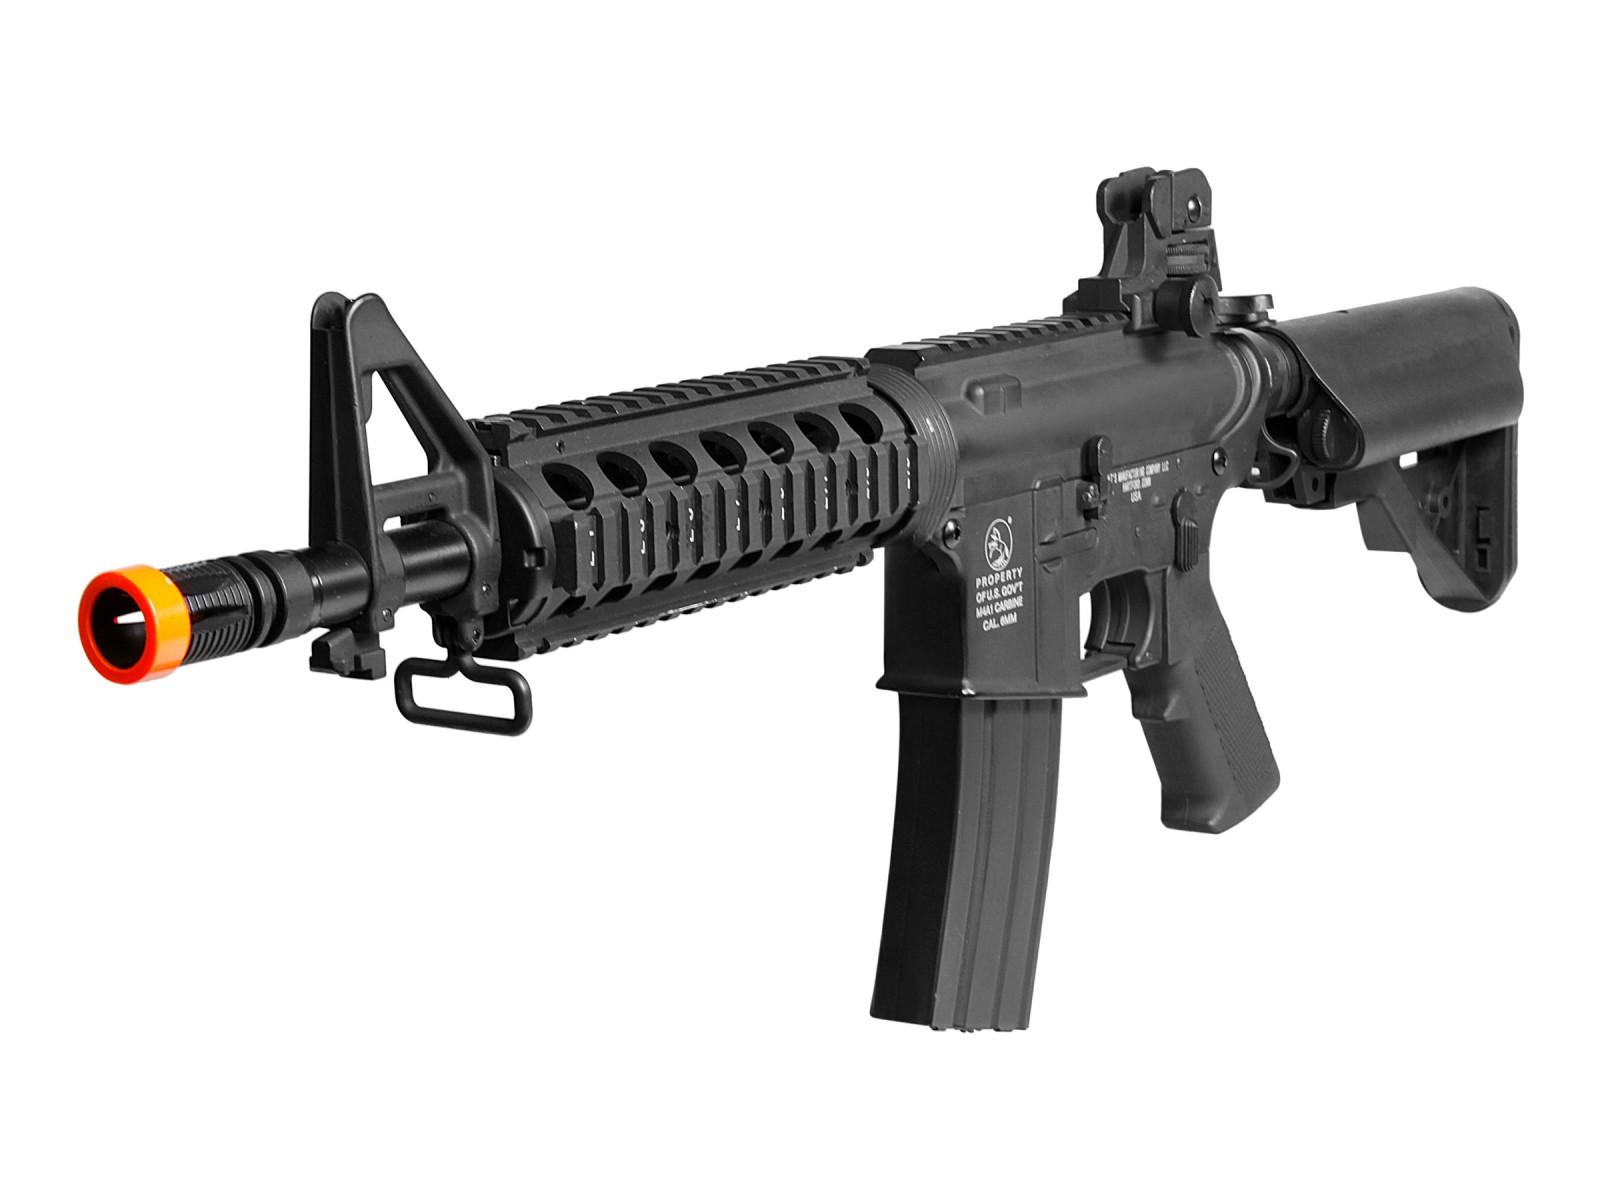 Colt_M4_CQB_Full_Metal_AEG_Black_6mm